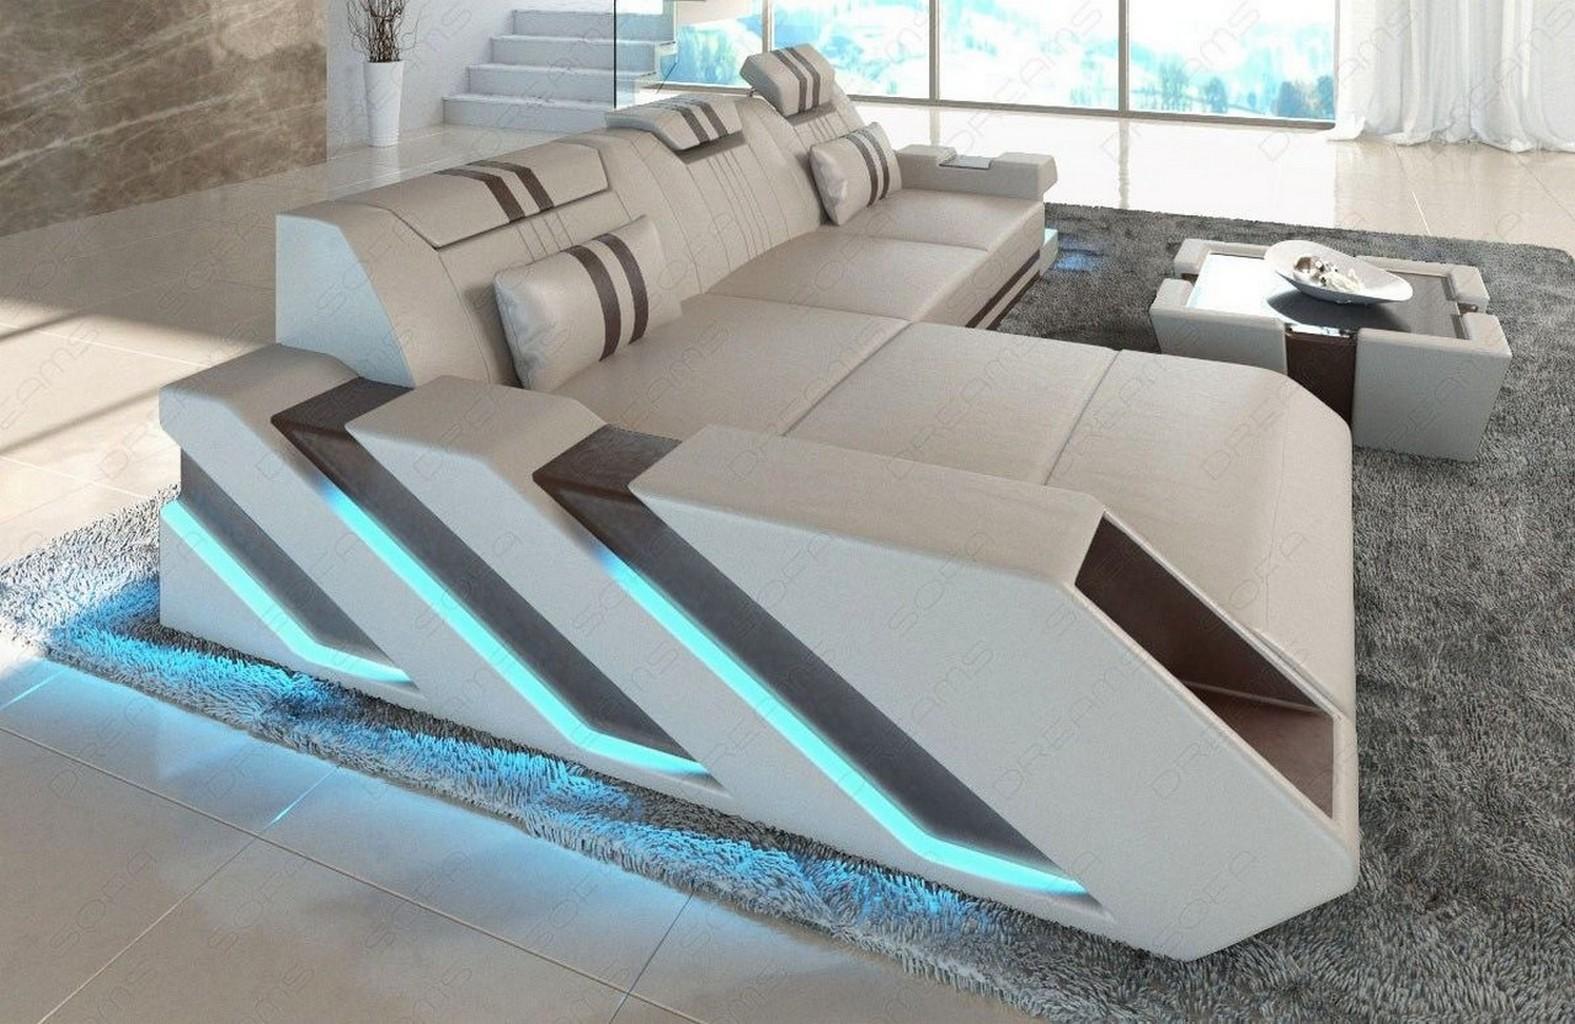 ledersofa eckcouch apollonia l form designer couch + led ... - Designer Couch Modelle Komfort